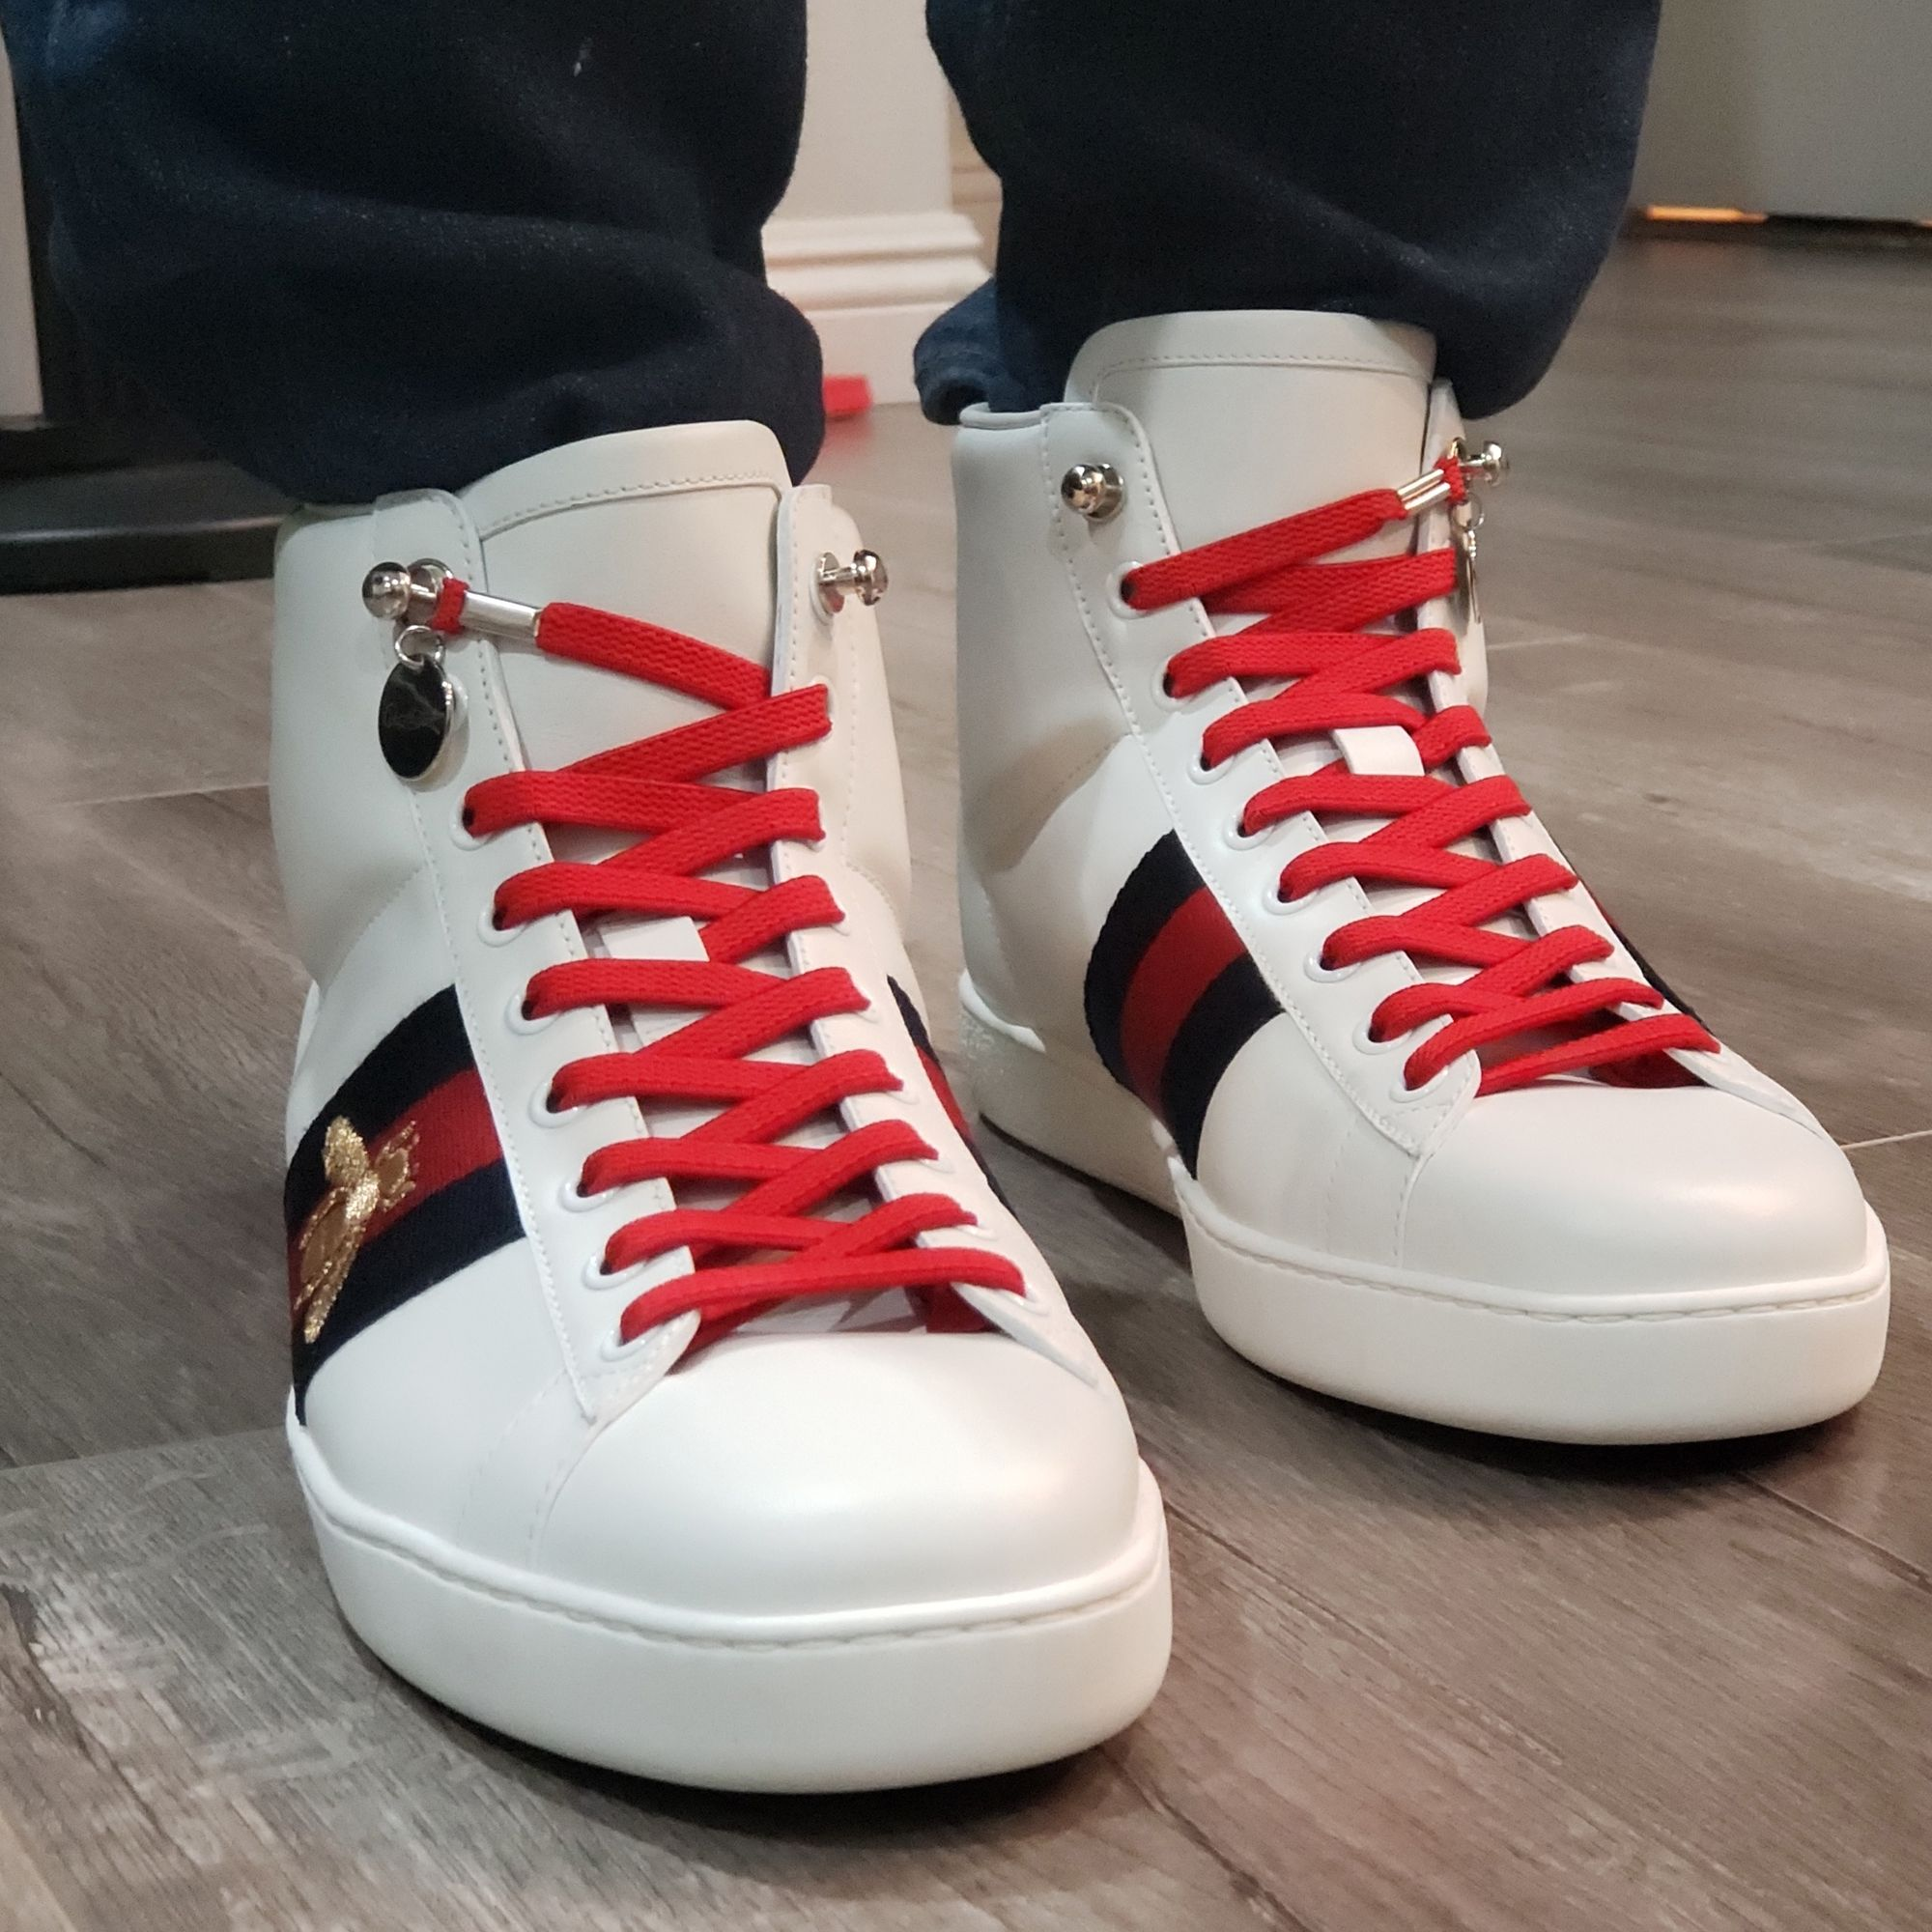 No Tie Shoelaces on Gucci high top